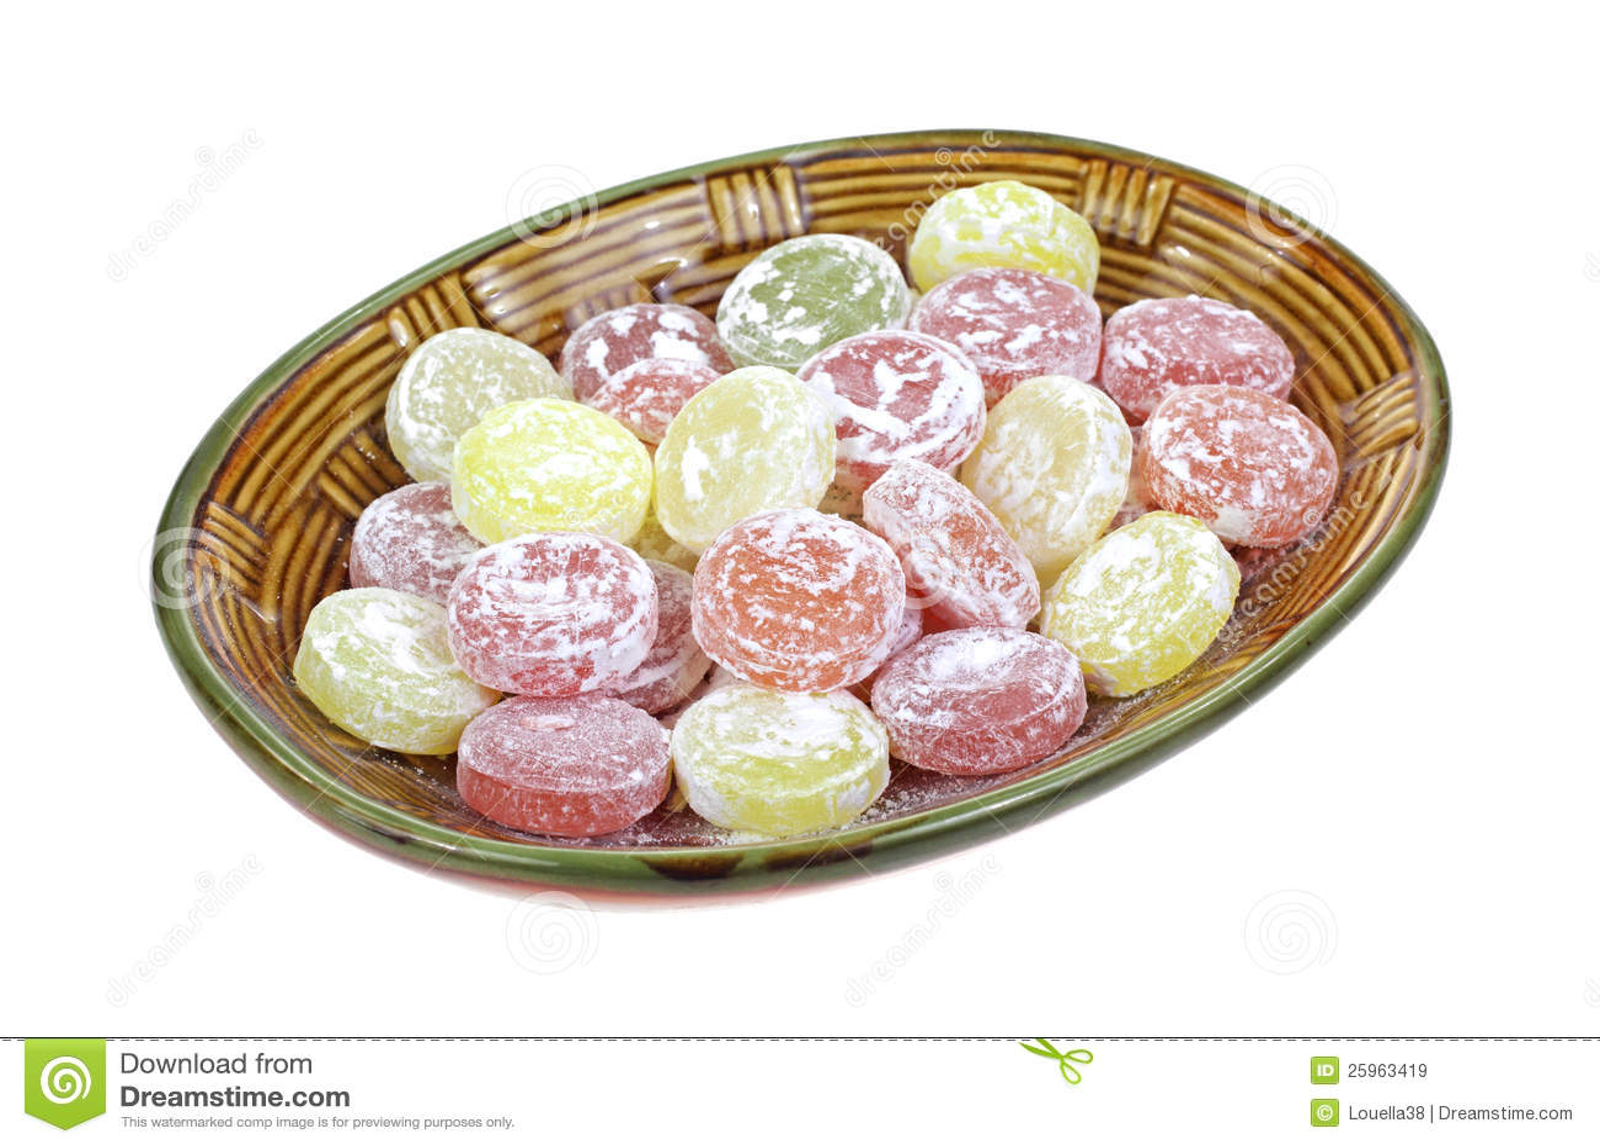 Round Hard Candy Dish Angle Royalty Free Stock Images  : round hard candy dish angle 25963419 from www.dreamstime.com size 1300 x 948 jpeg 155kB